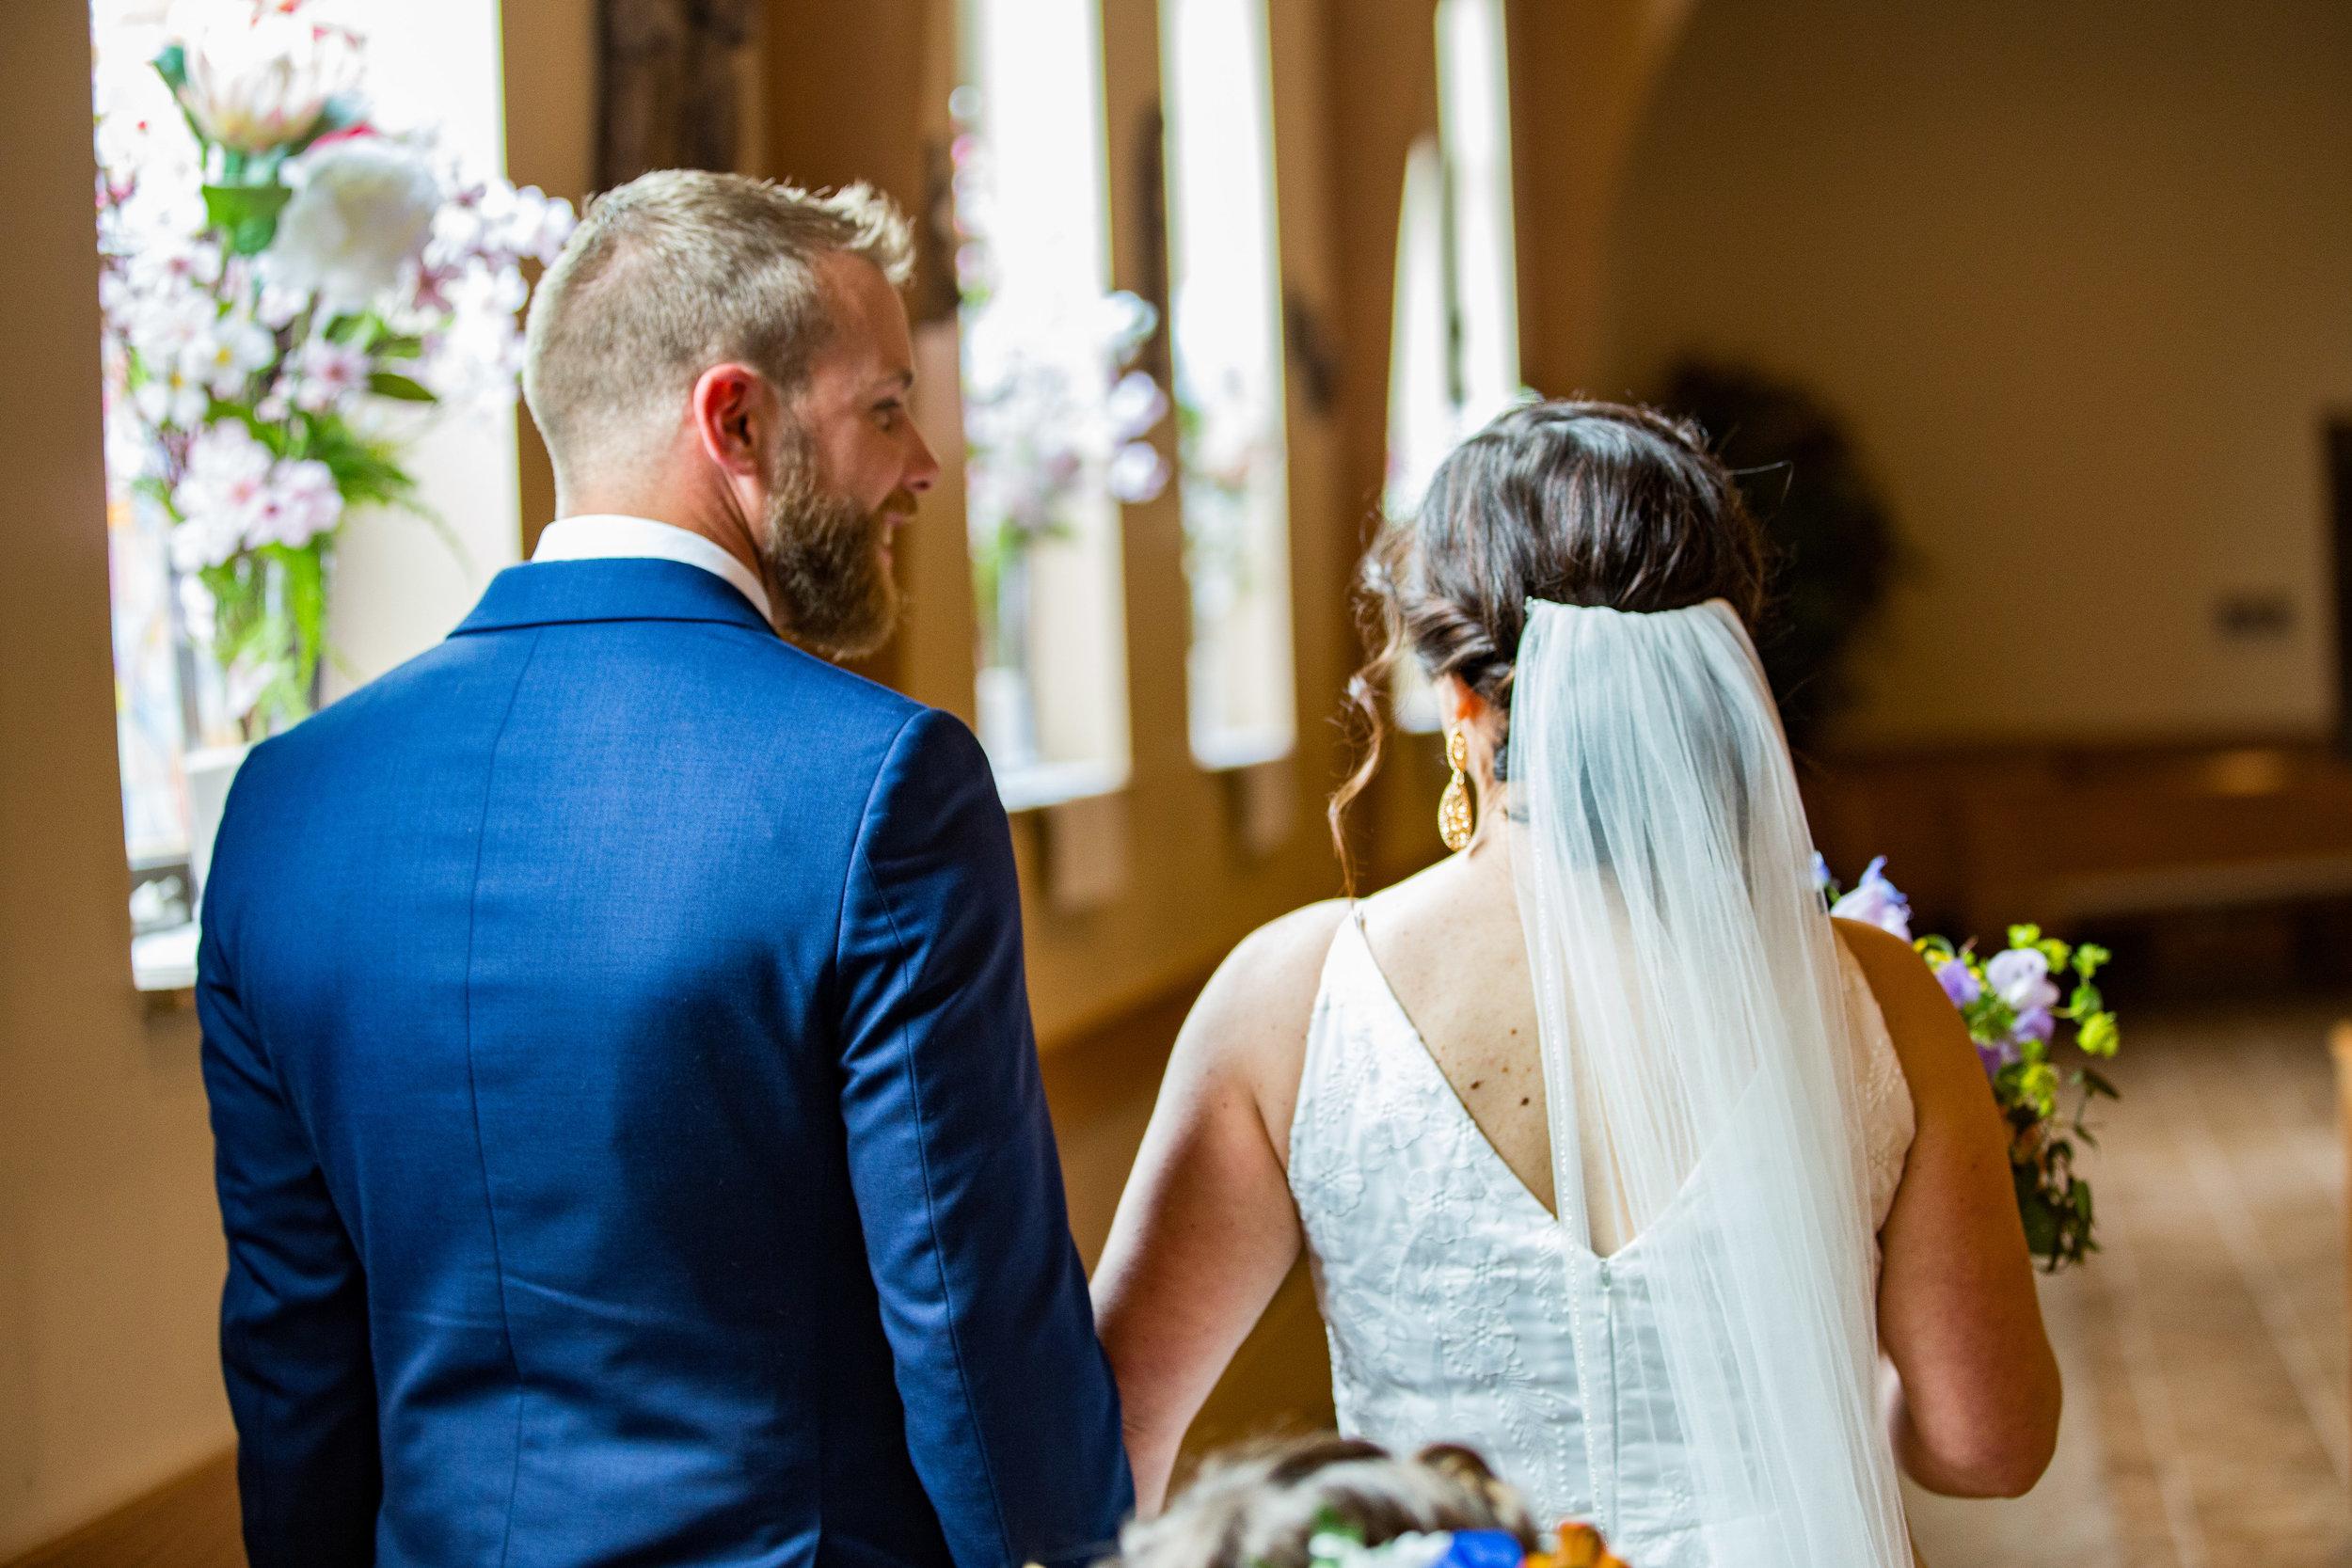 Natalie and Dallas Mooney Wedding 6-8-19_Tania Watt Photography-152.jpg